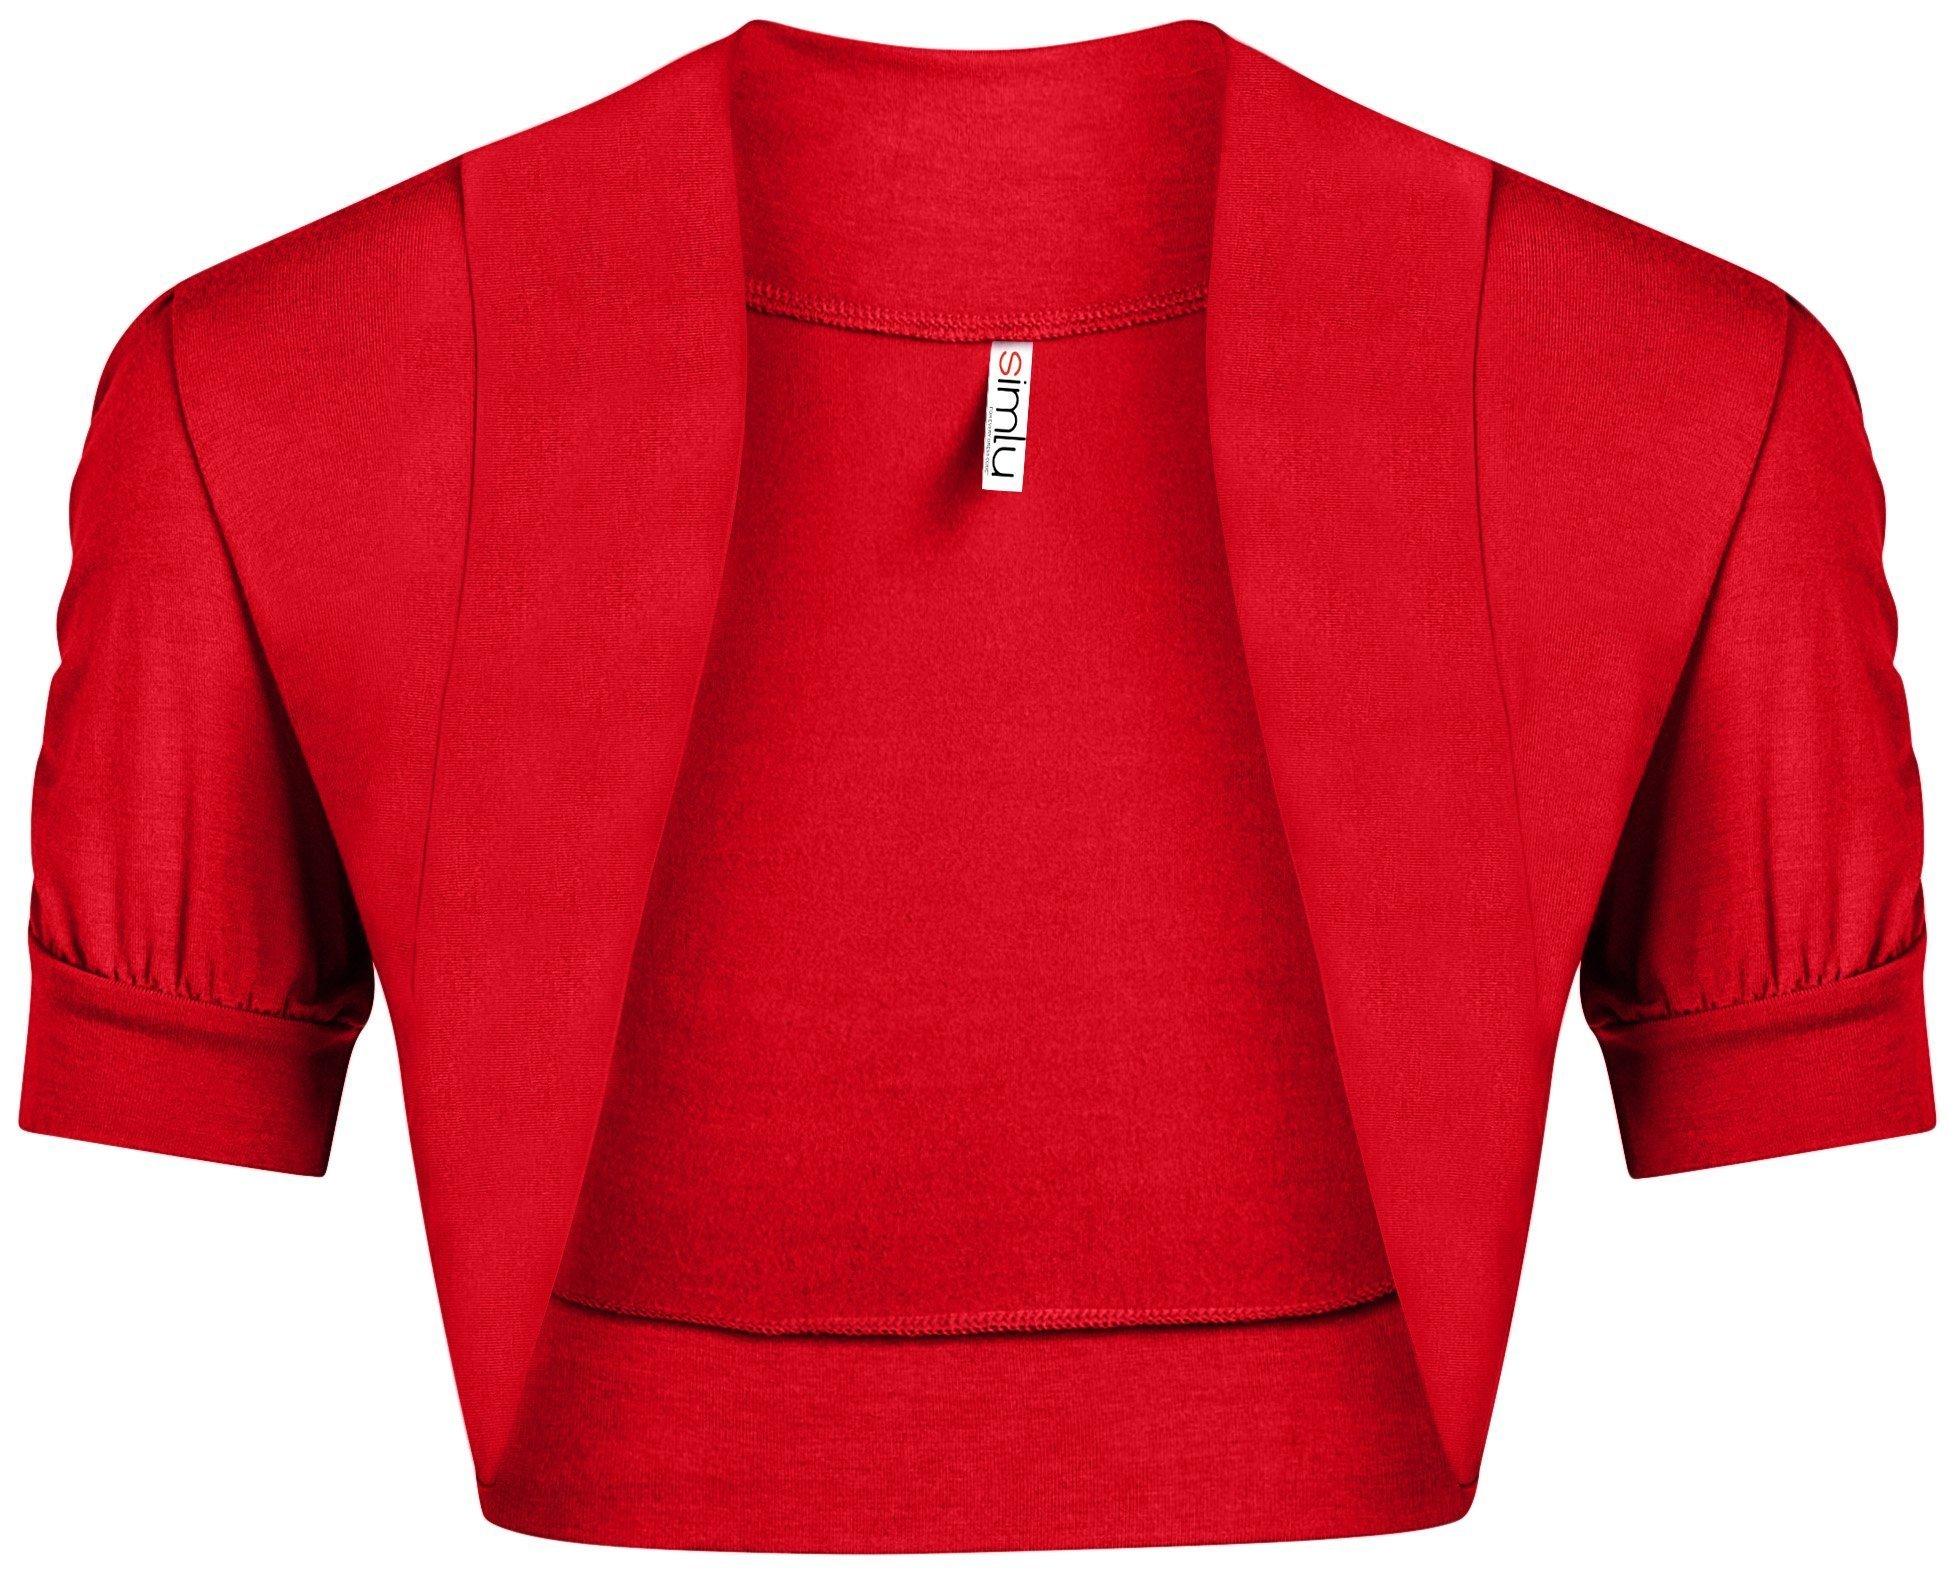 Red Shrug for Women Plus Size and Regular Size Short Gathered Sleeve Red Bolero Jacket,Red,X-Large